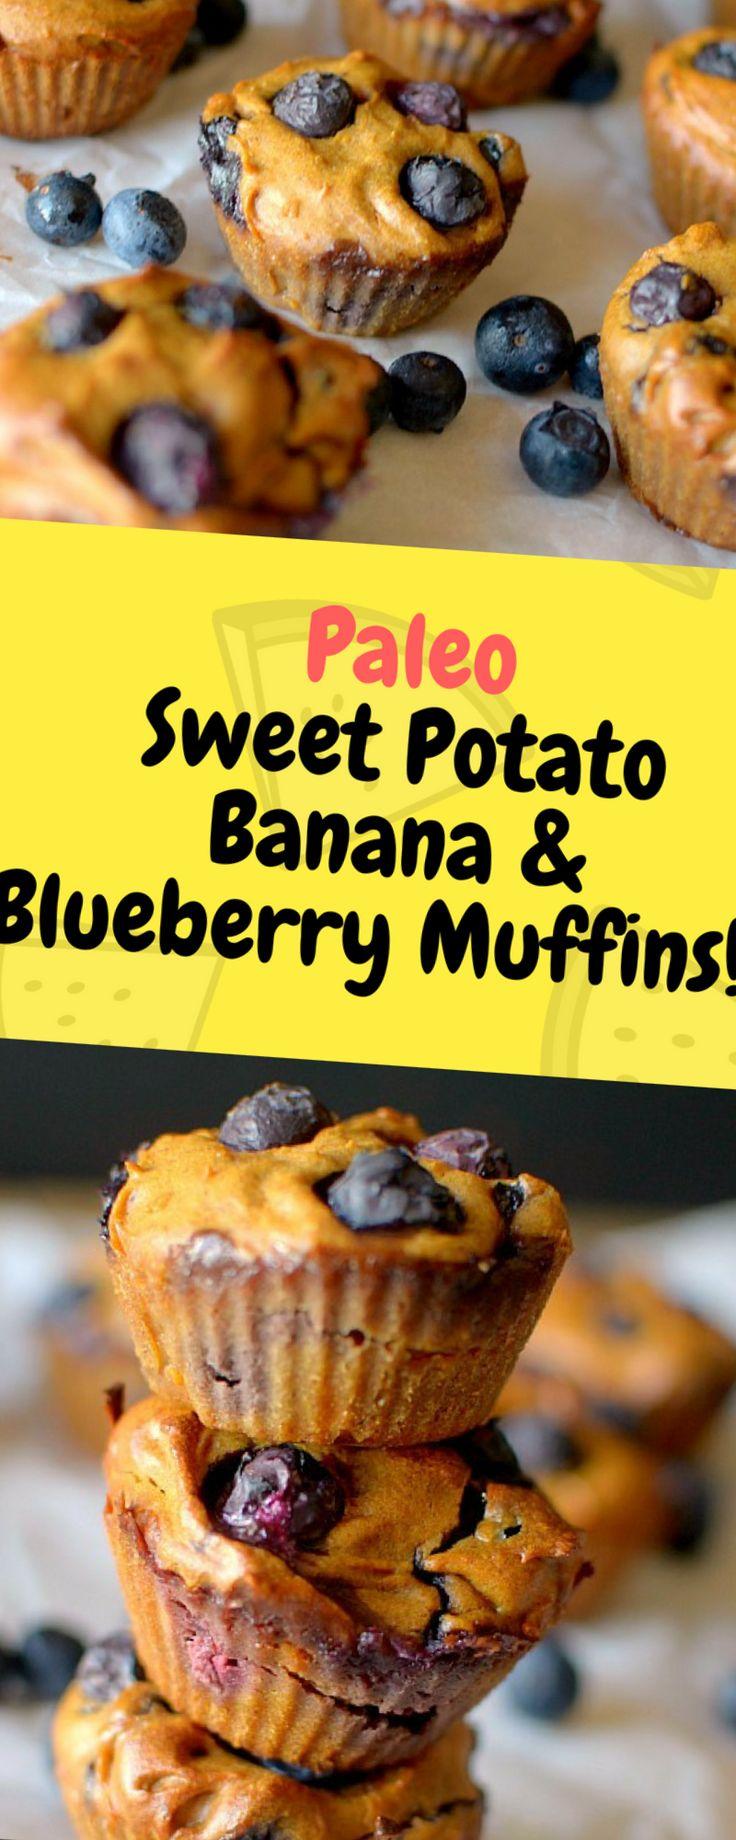 Paleo Sweet Potato Banana & Blueberry Muffins – One of food